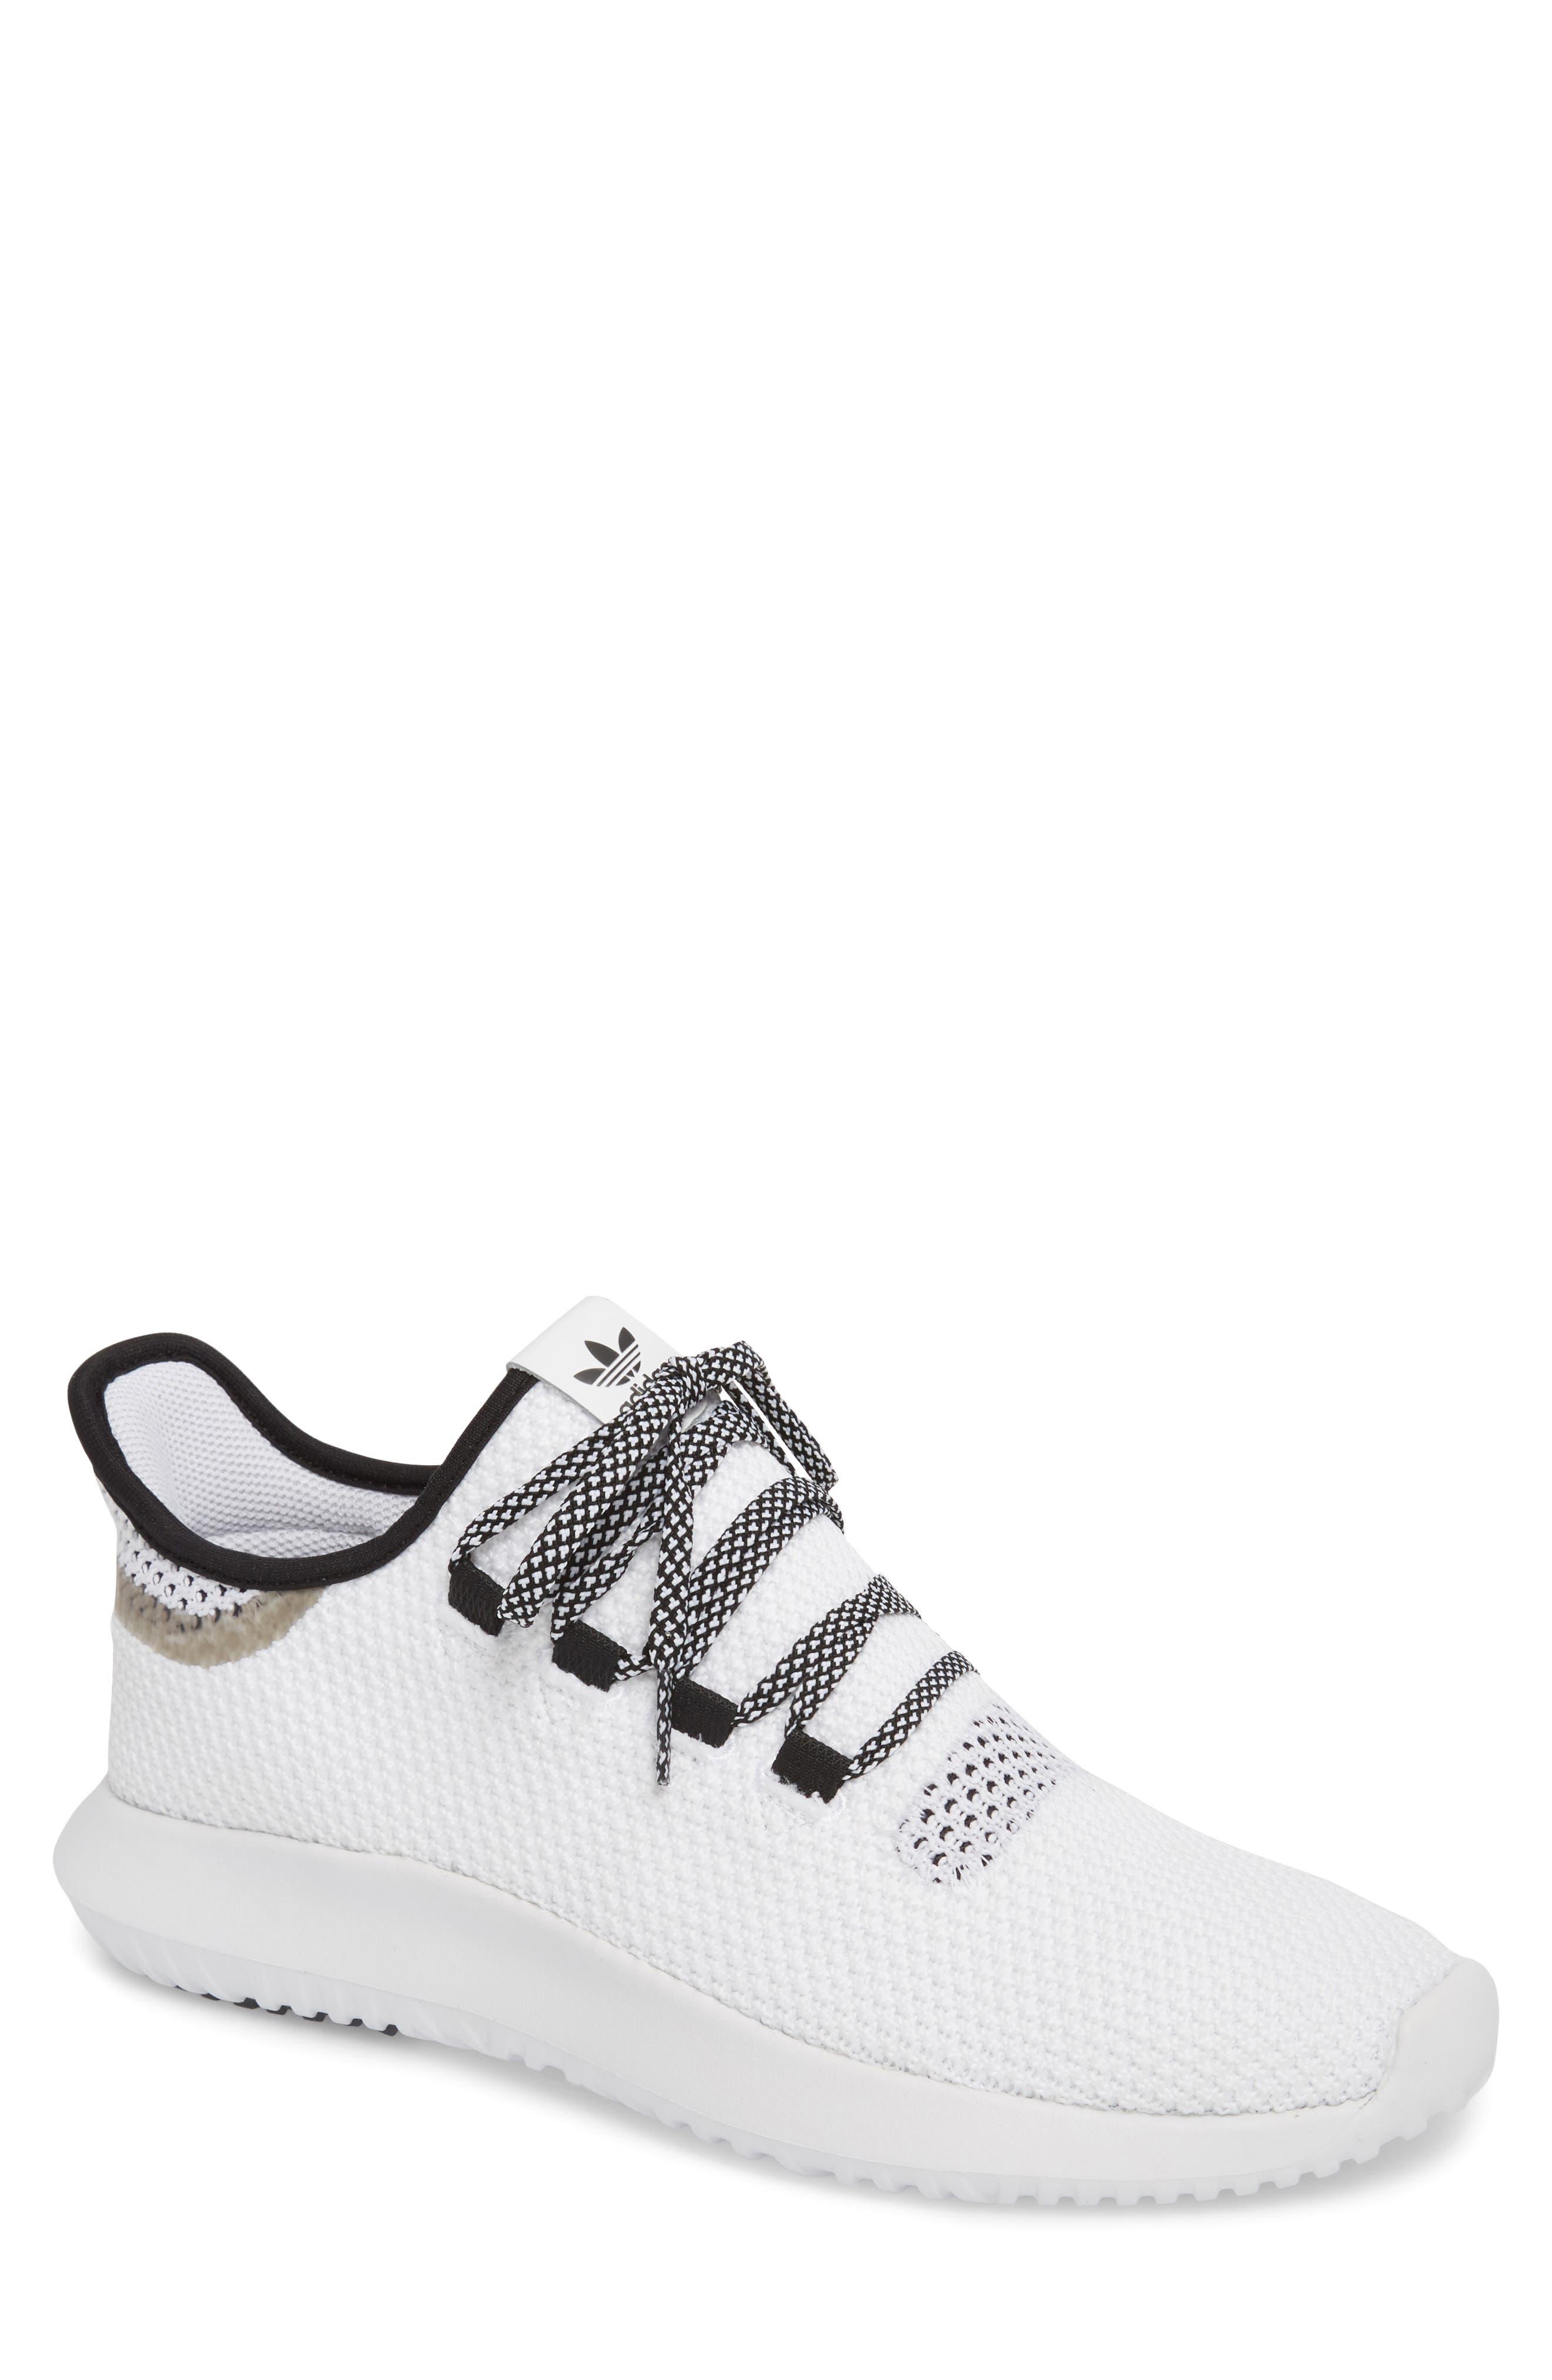 adidas Tubular Shadow CK Sneaker (Men)